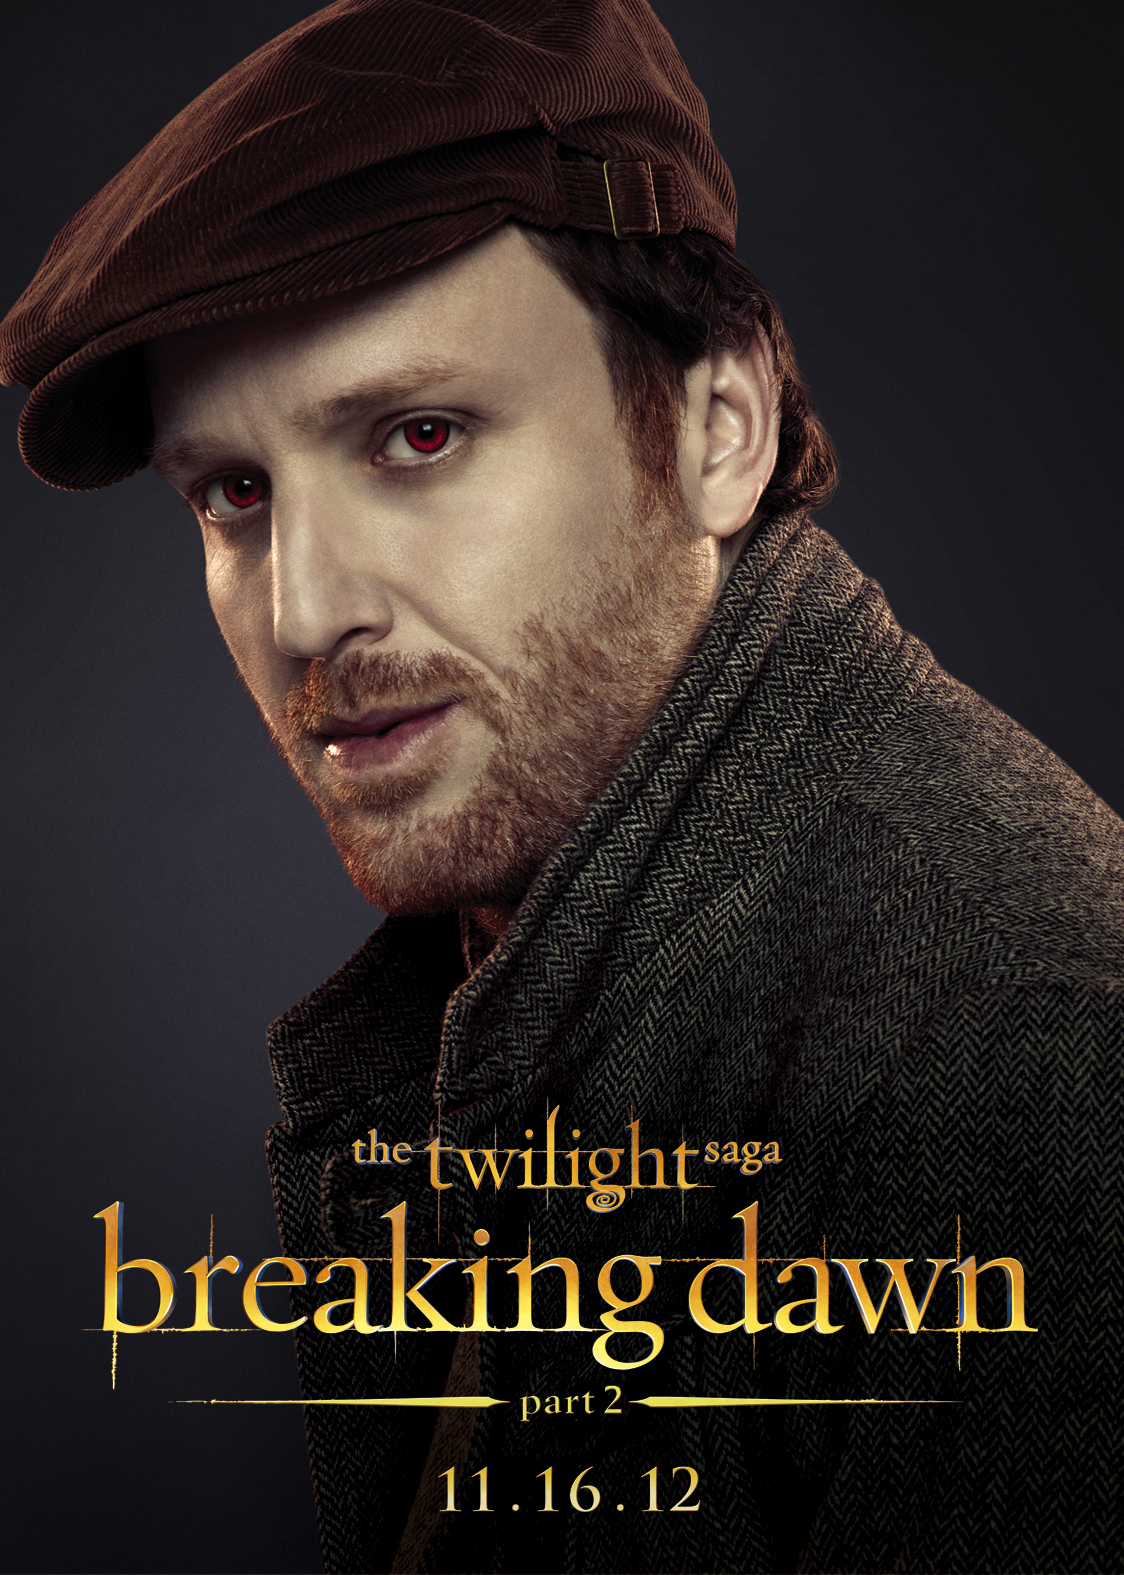 http://4.bp.blogspot.com/-j3KTyZTytYc/UBJYxZlxlWI/AAAAAAAAC-I/vx56HBbitRk/s1600/the-twilight-saga-breaking-dawn-part-2-liam.jpg